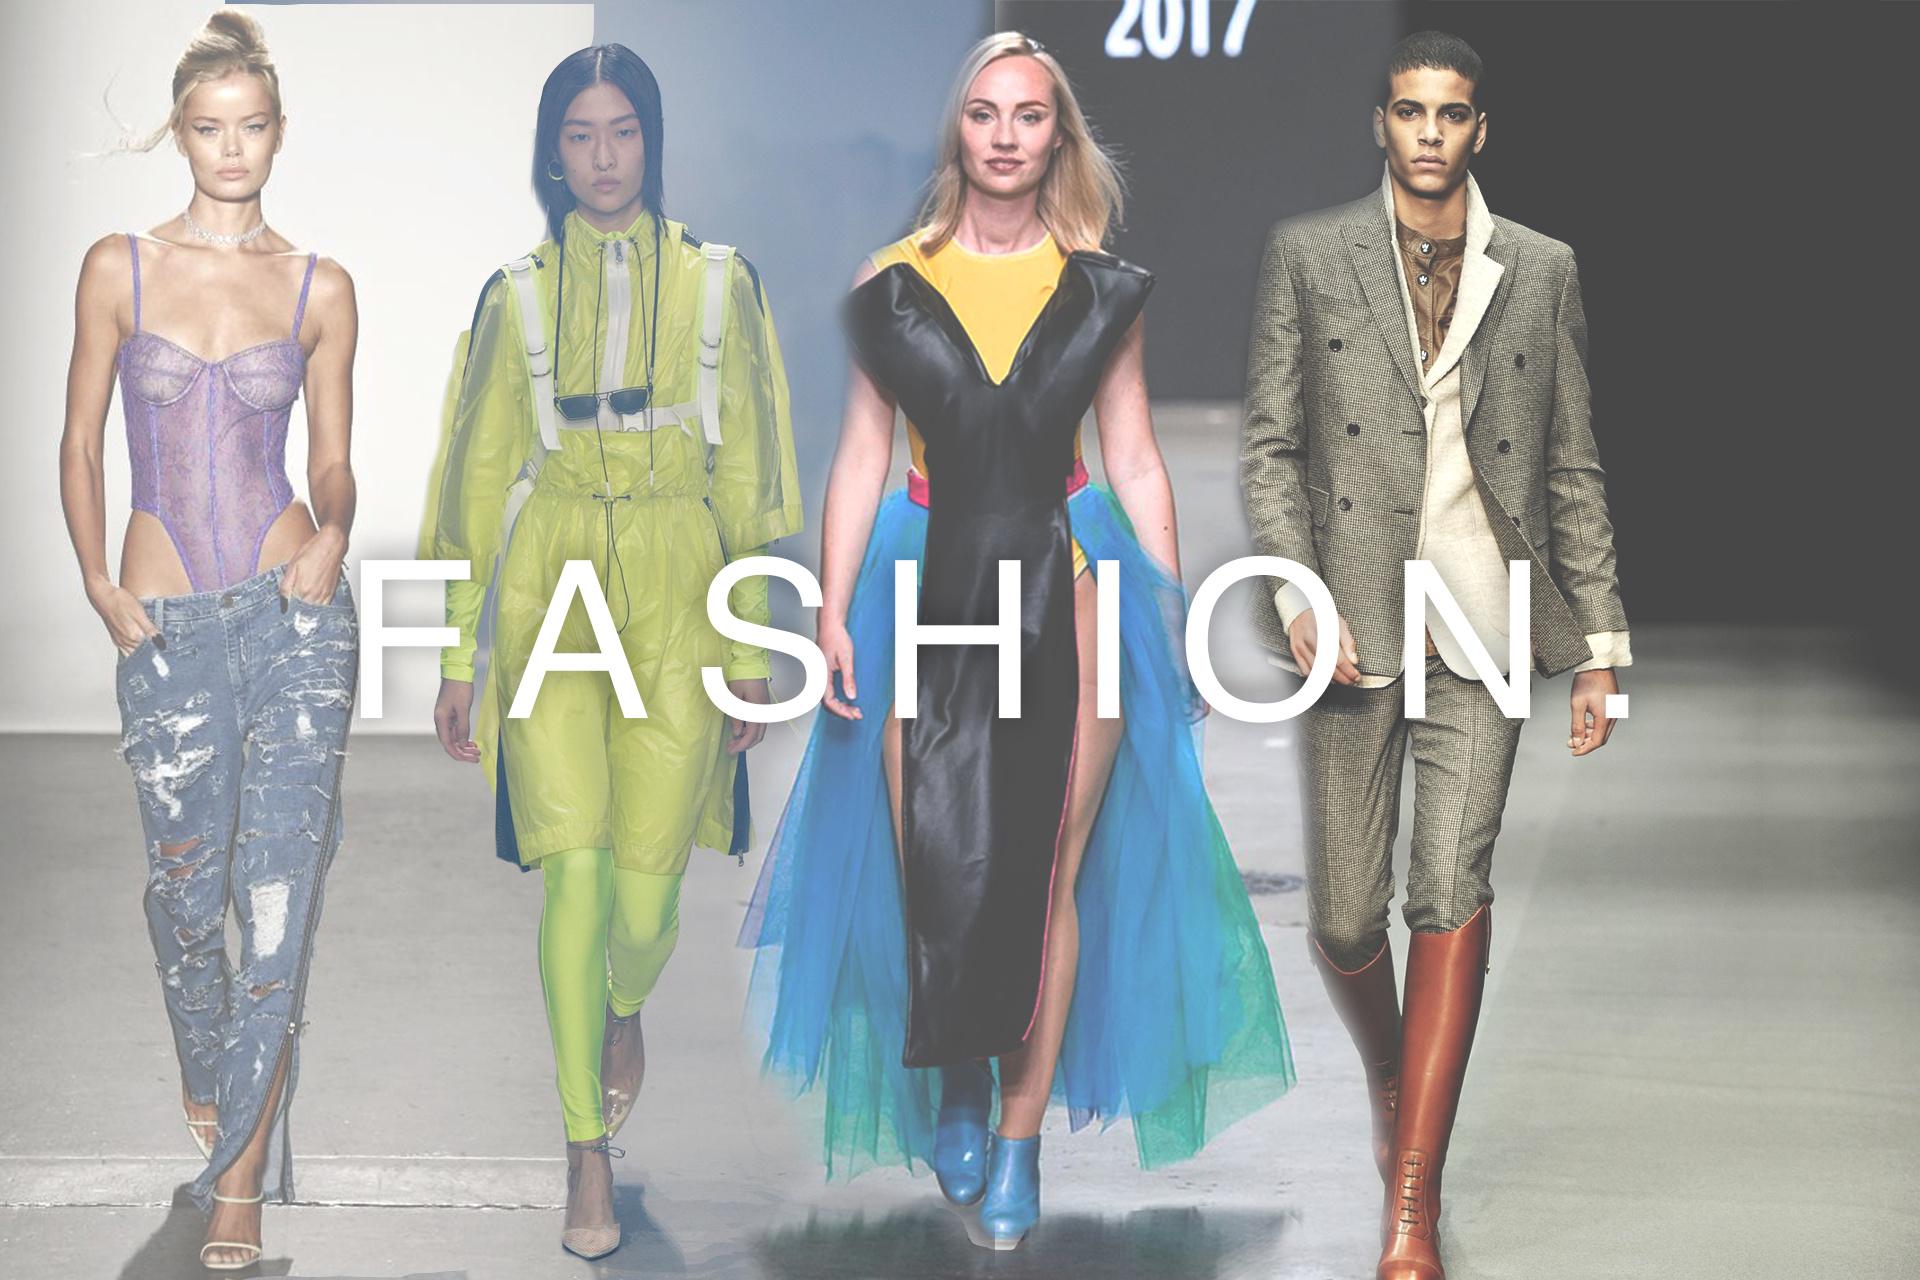 Fashionable landen